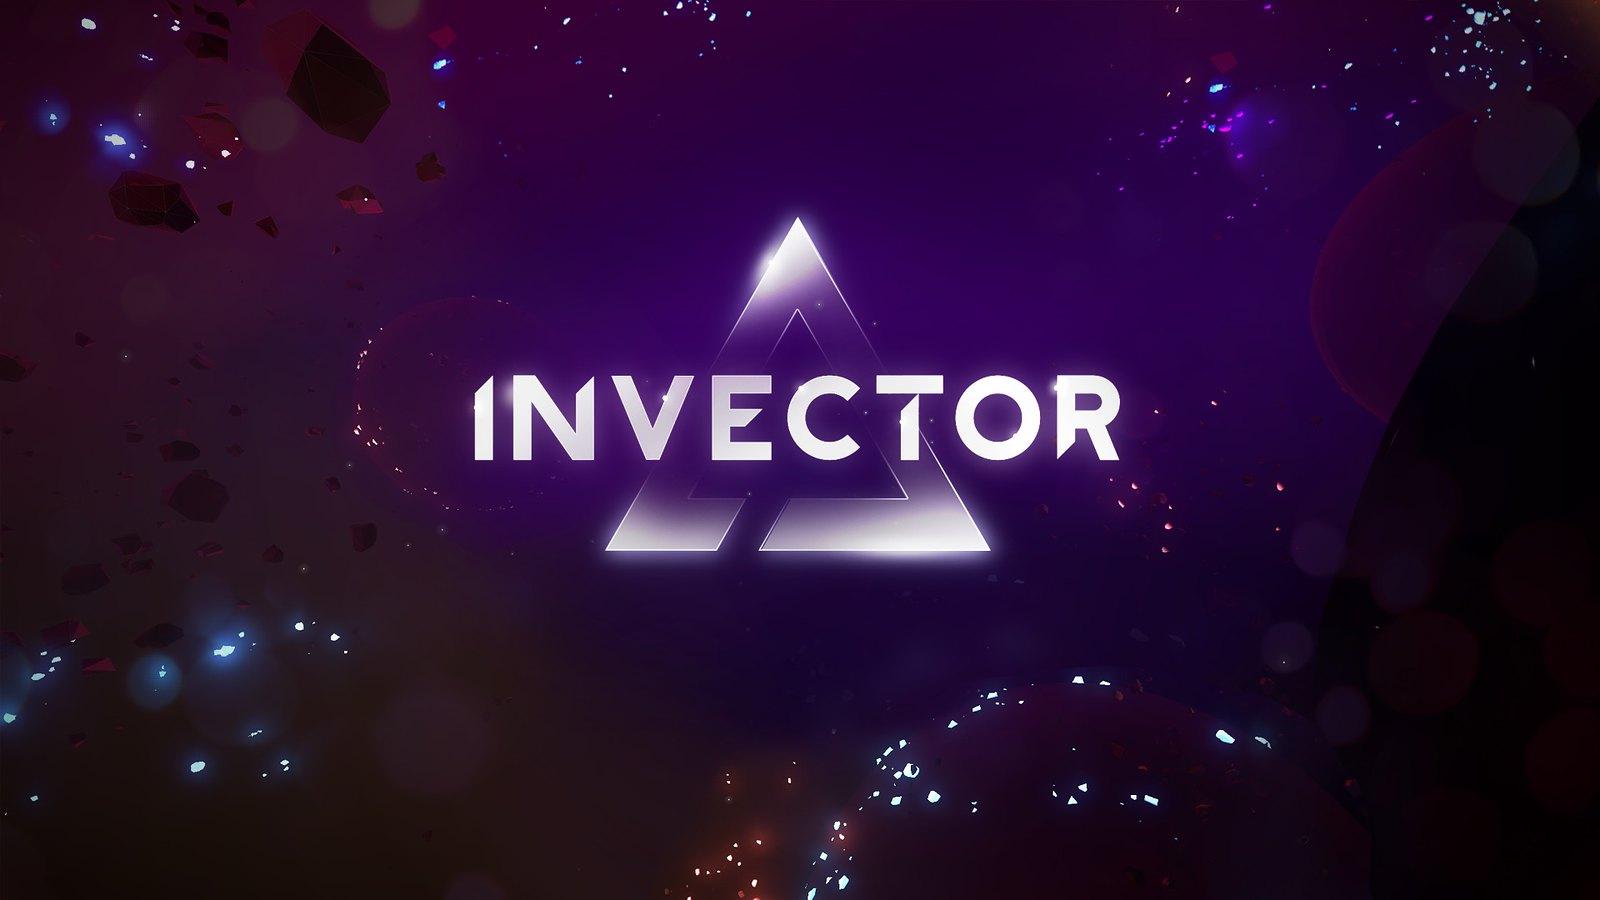 Invector PGW-02